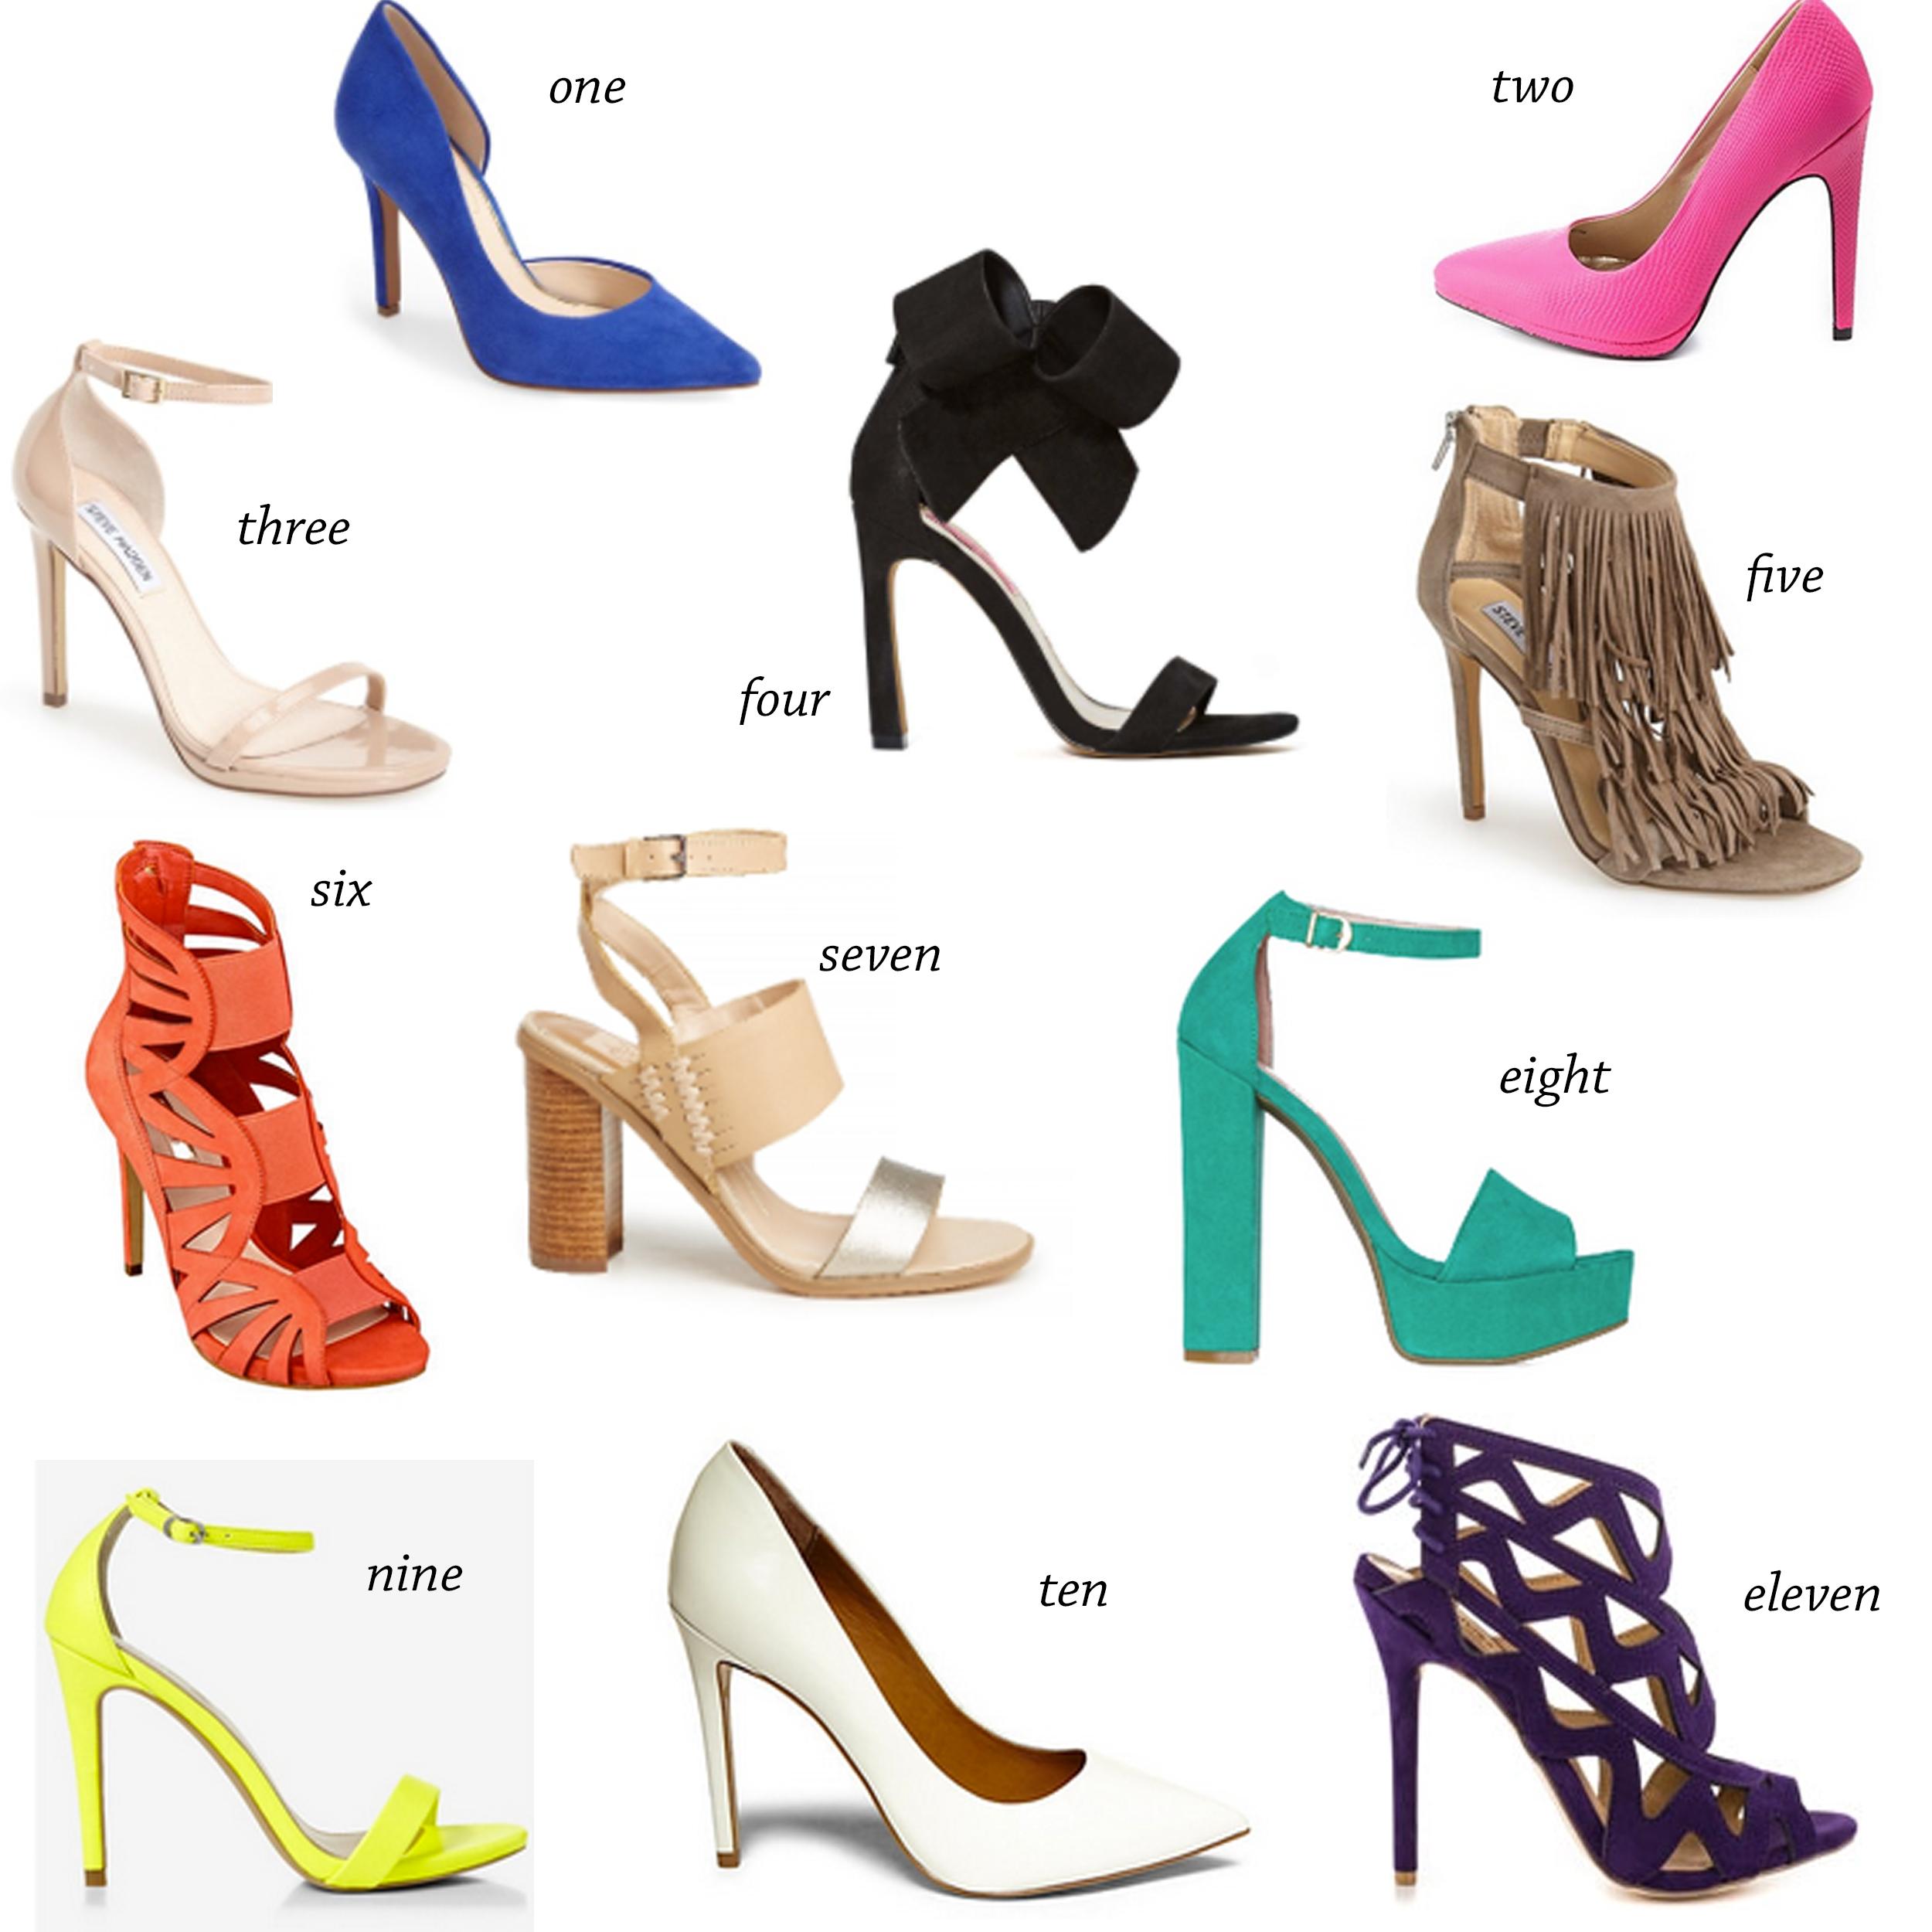 missyonmadison springfootwear shoppingcollage springshoes purpleheels  fringeheels bluepumps cobaltbluepumps stevemadden whitepumps nudesandals  blocksandals ...